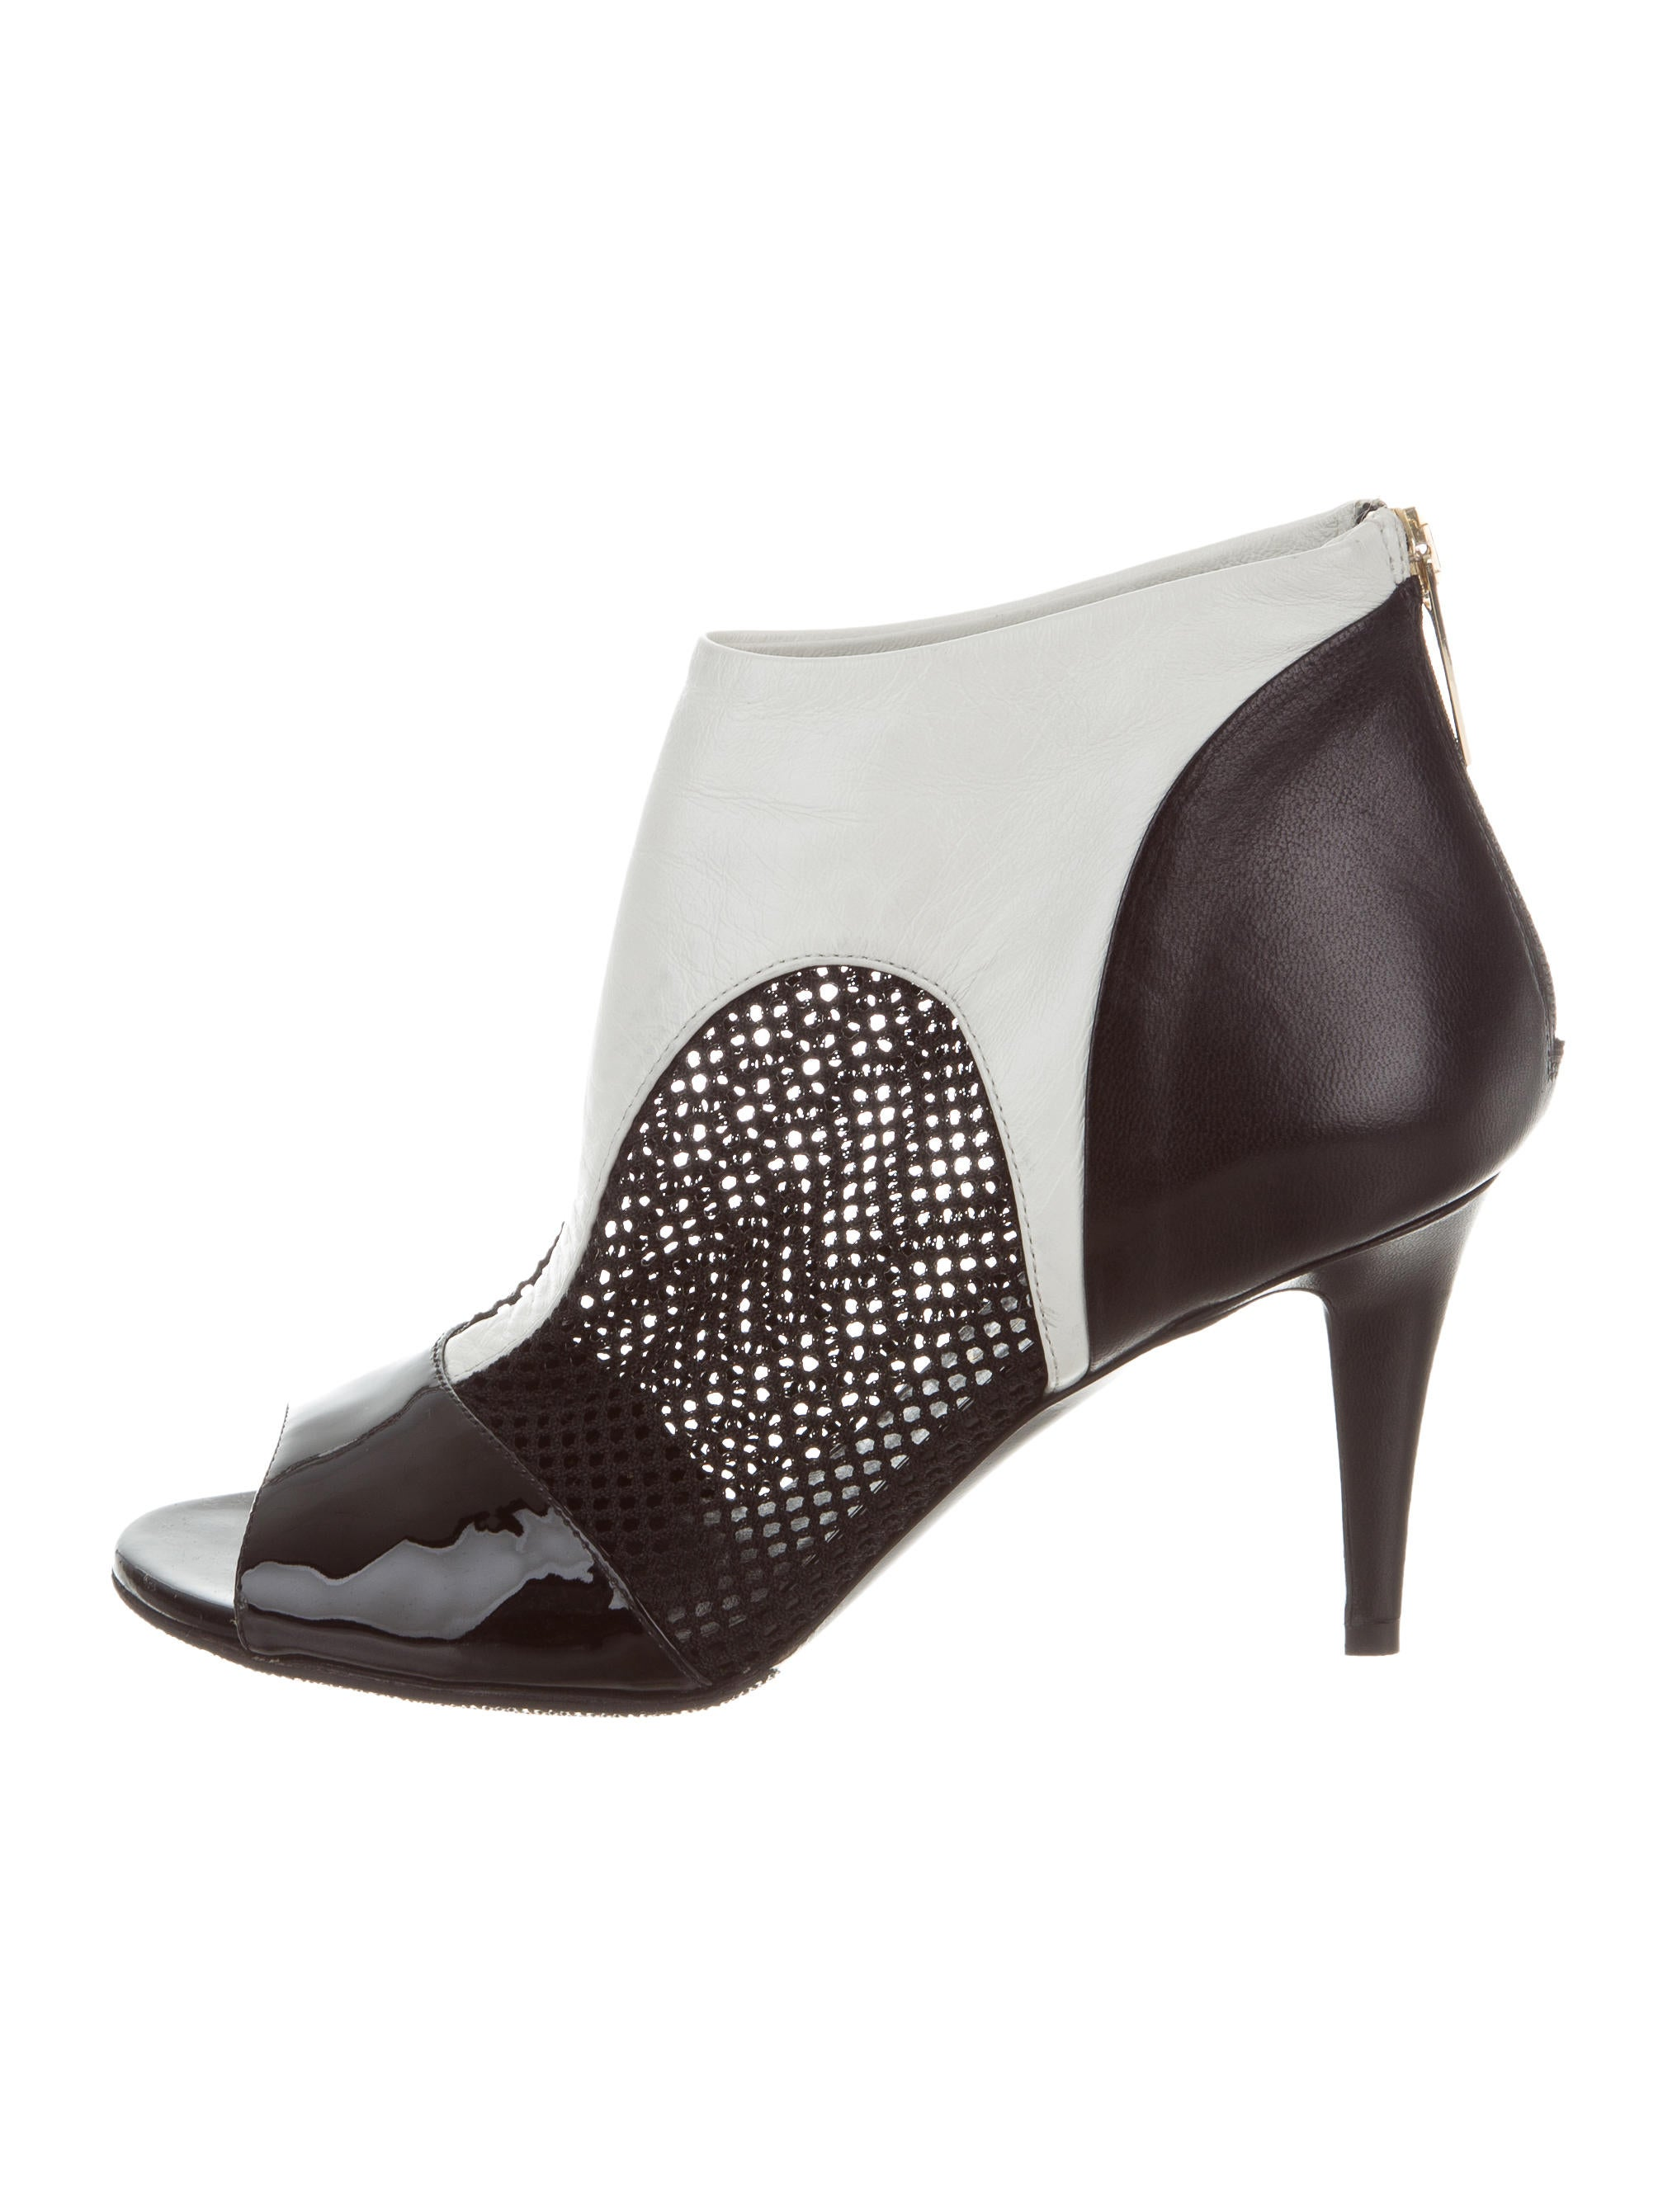 Tamara Mellon Leather Peep-Toe Ankle Boots cheap buy cheap amazon XL1mIlh